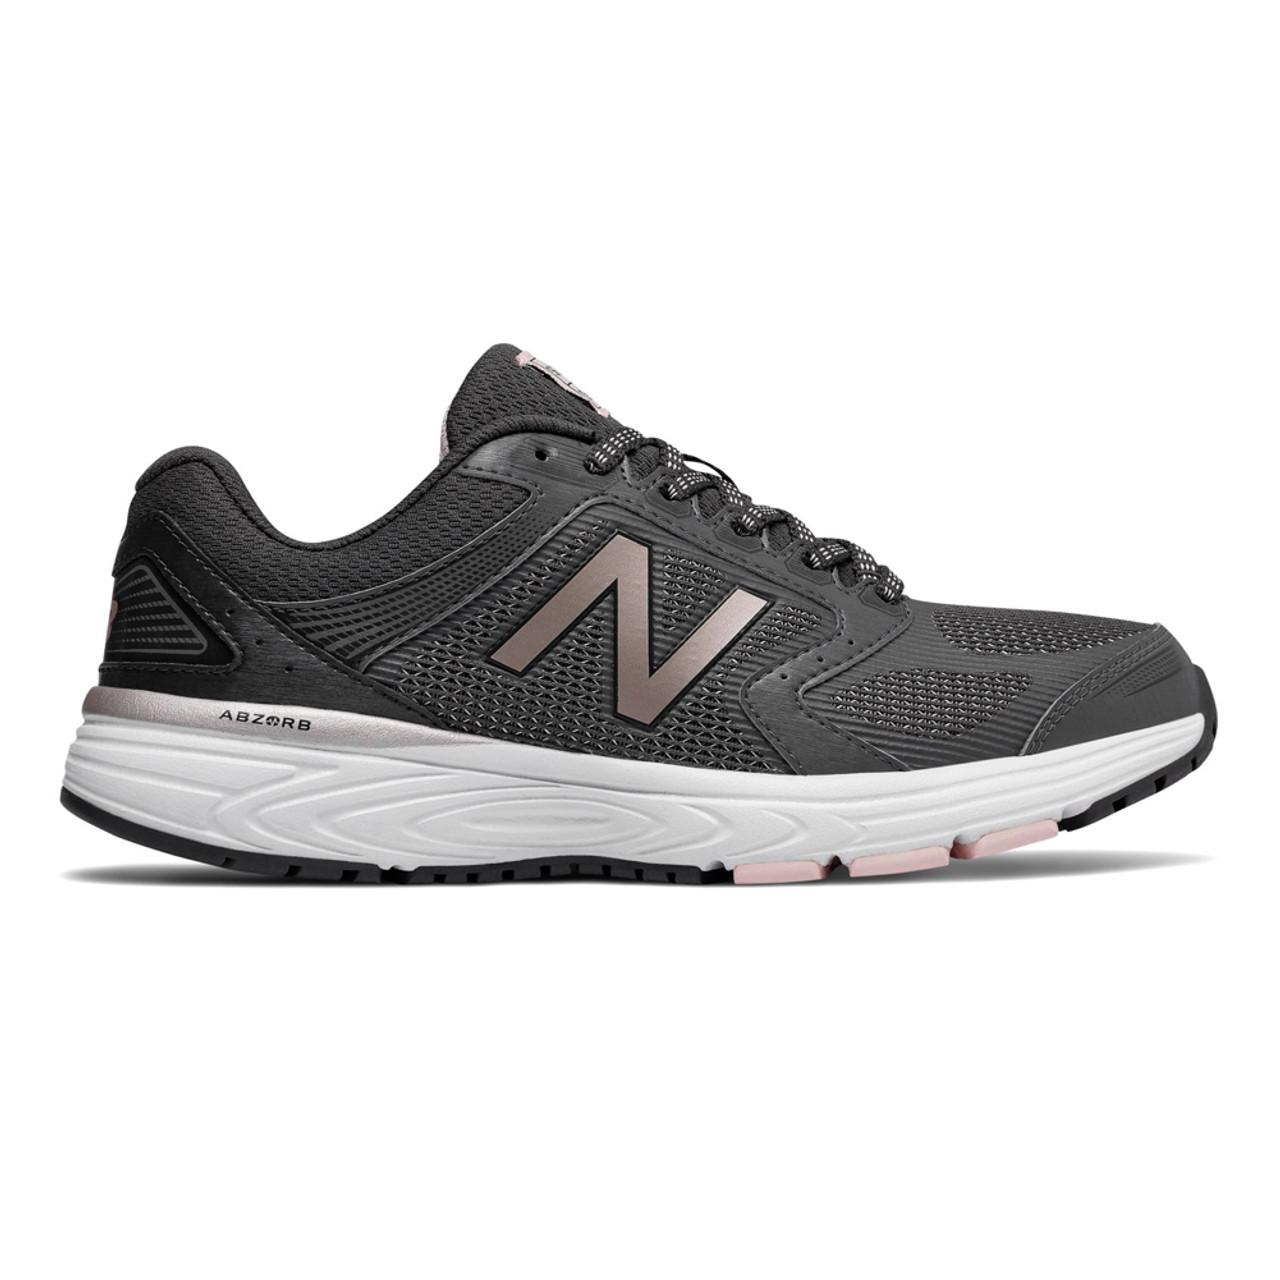 W560CM7 Running Shoe - Grey